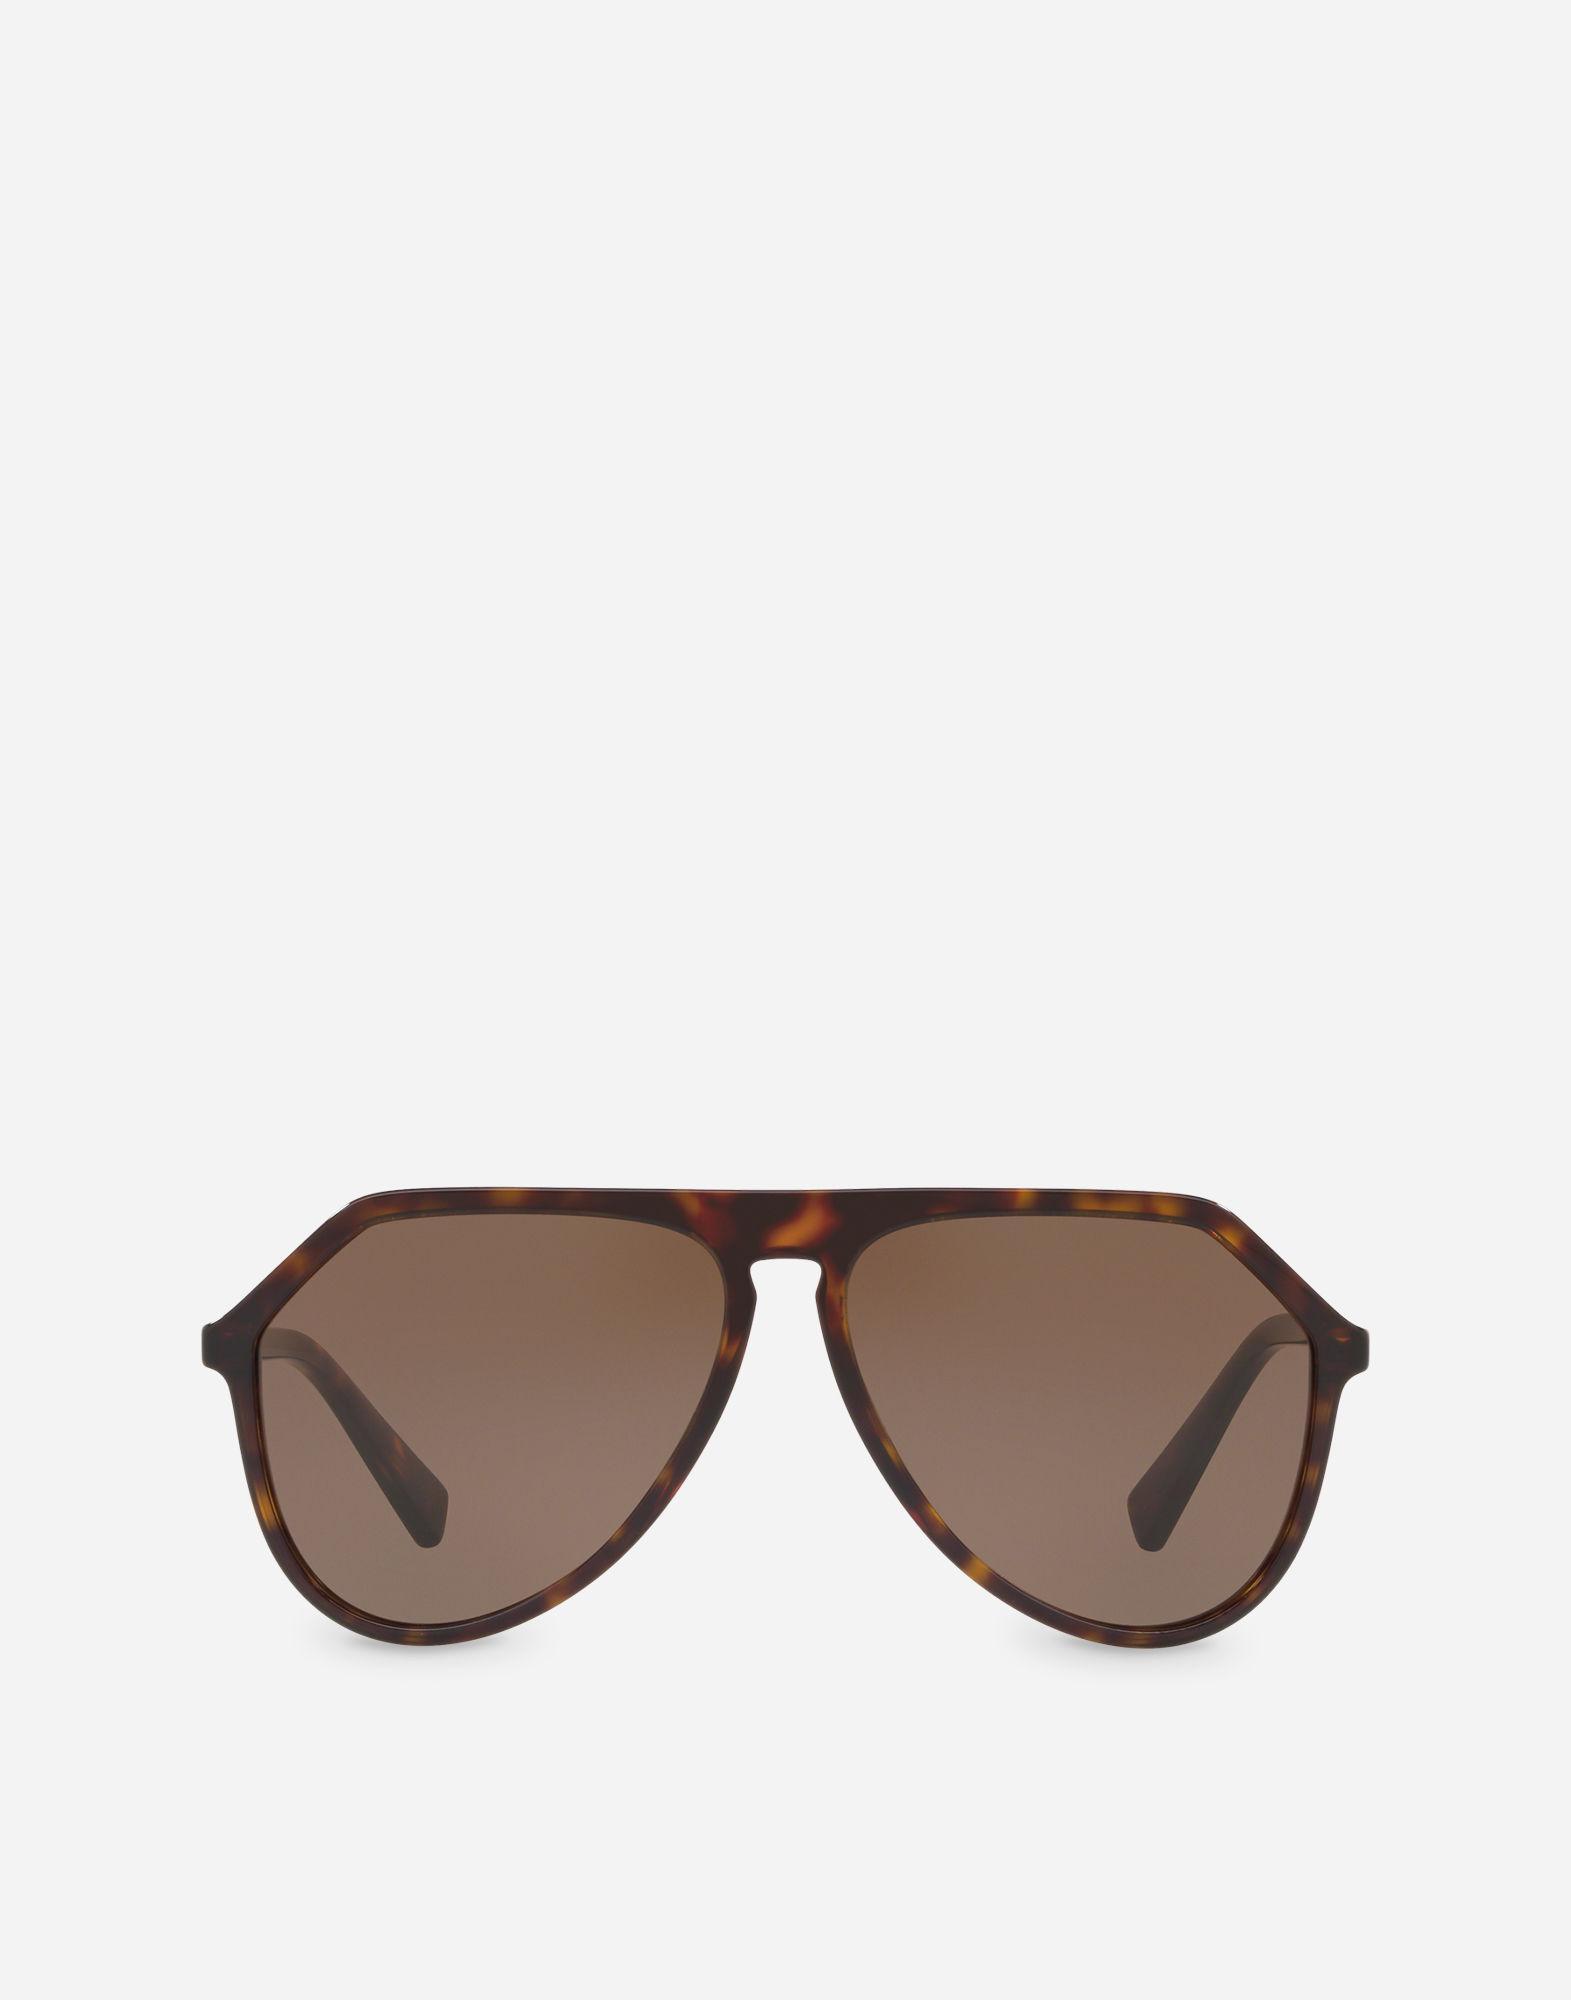 e4343ac1a12 Dolce   Gabbana Pilot Acetate Sunglasses With Keyhole Bridge In Havana